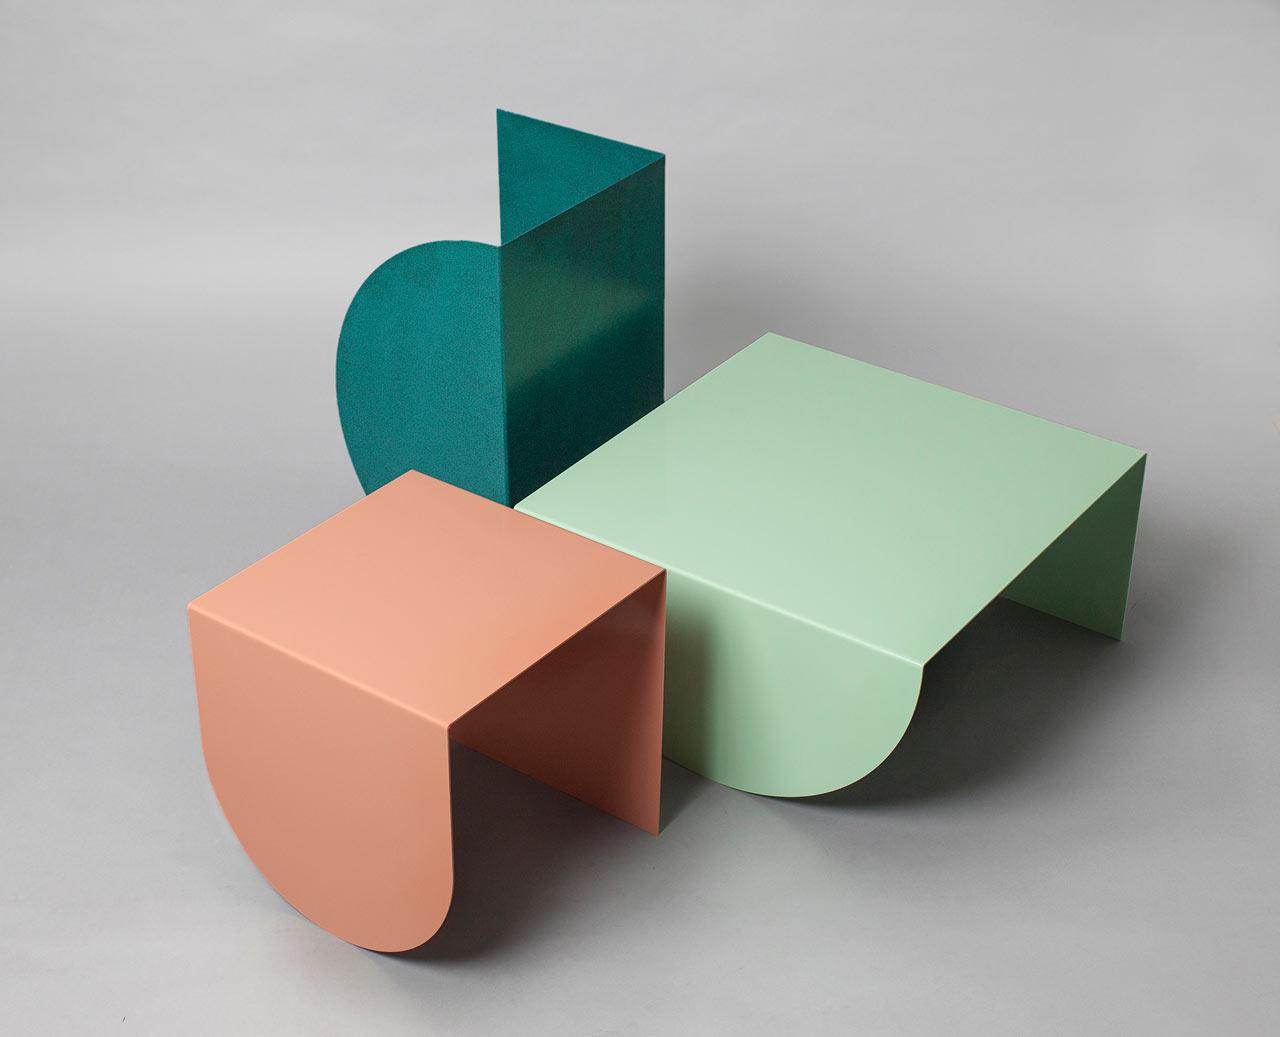 3legs-tables-modern-gemoetry-all